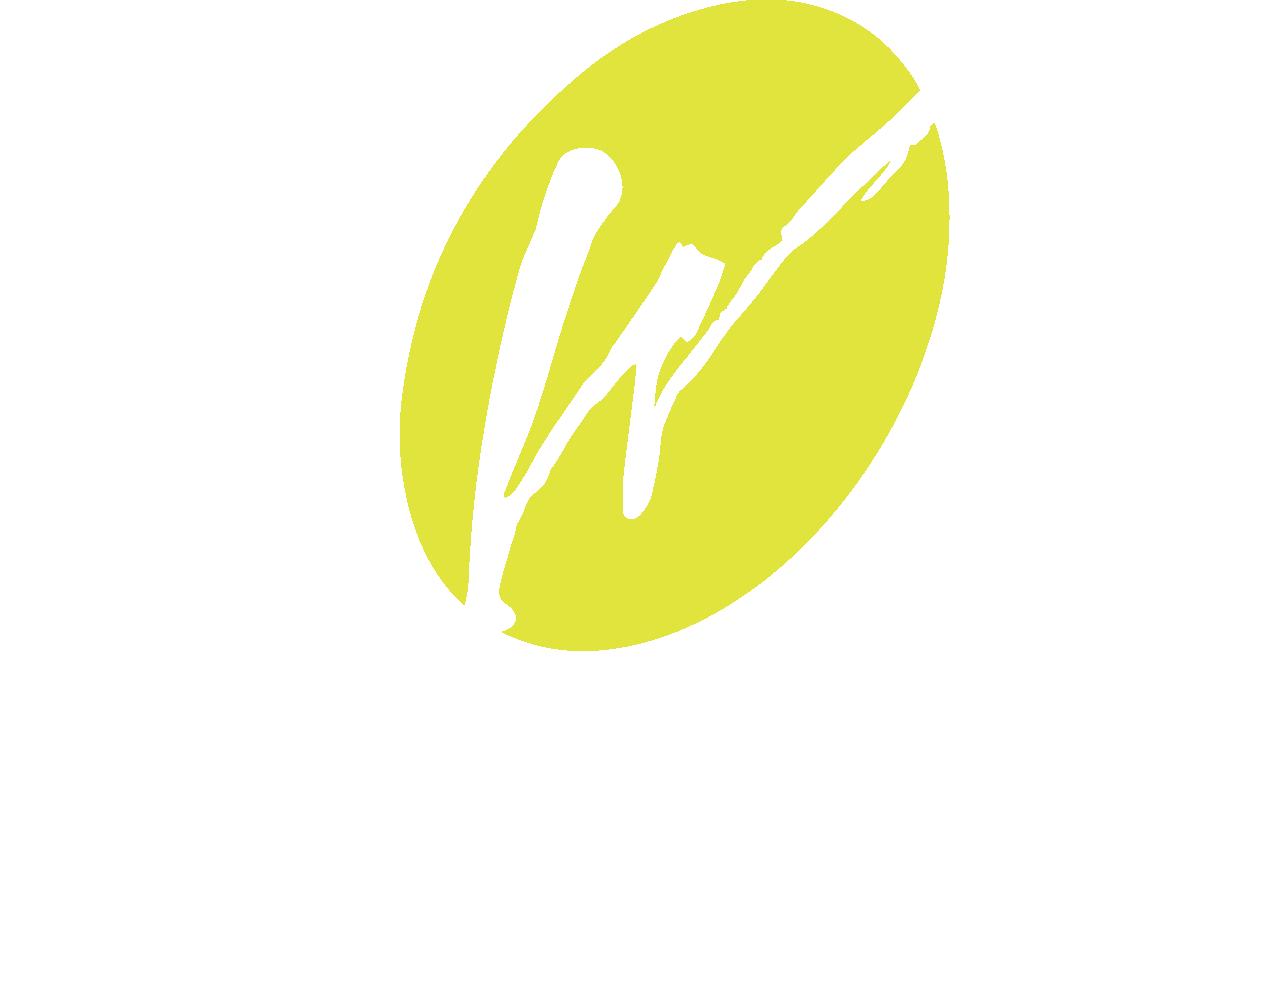 Weber Full Logo_Negative.png